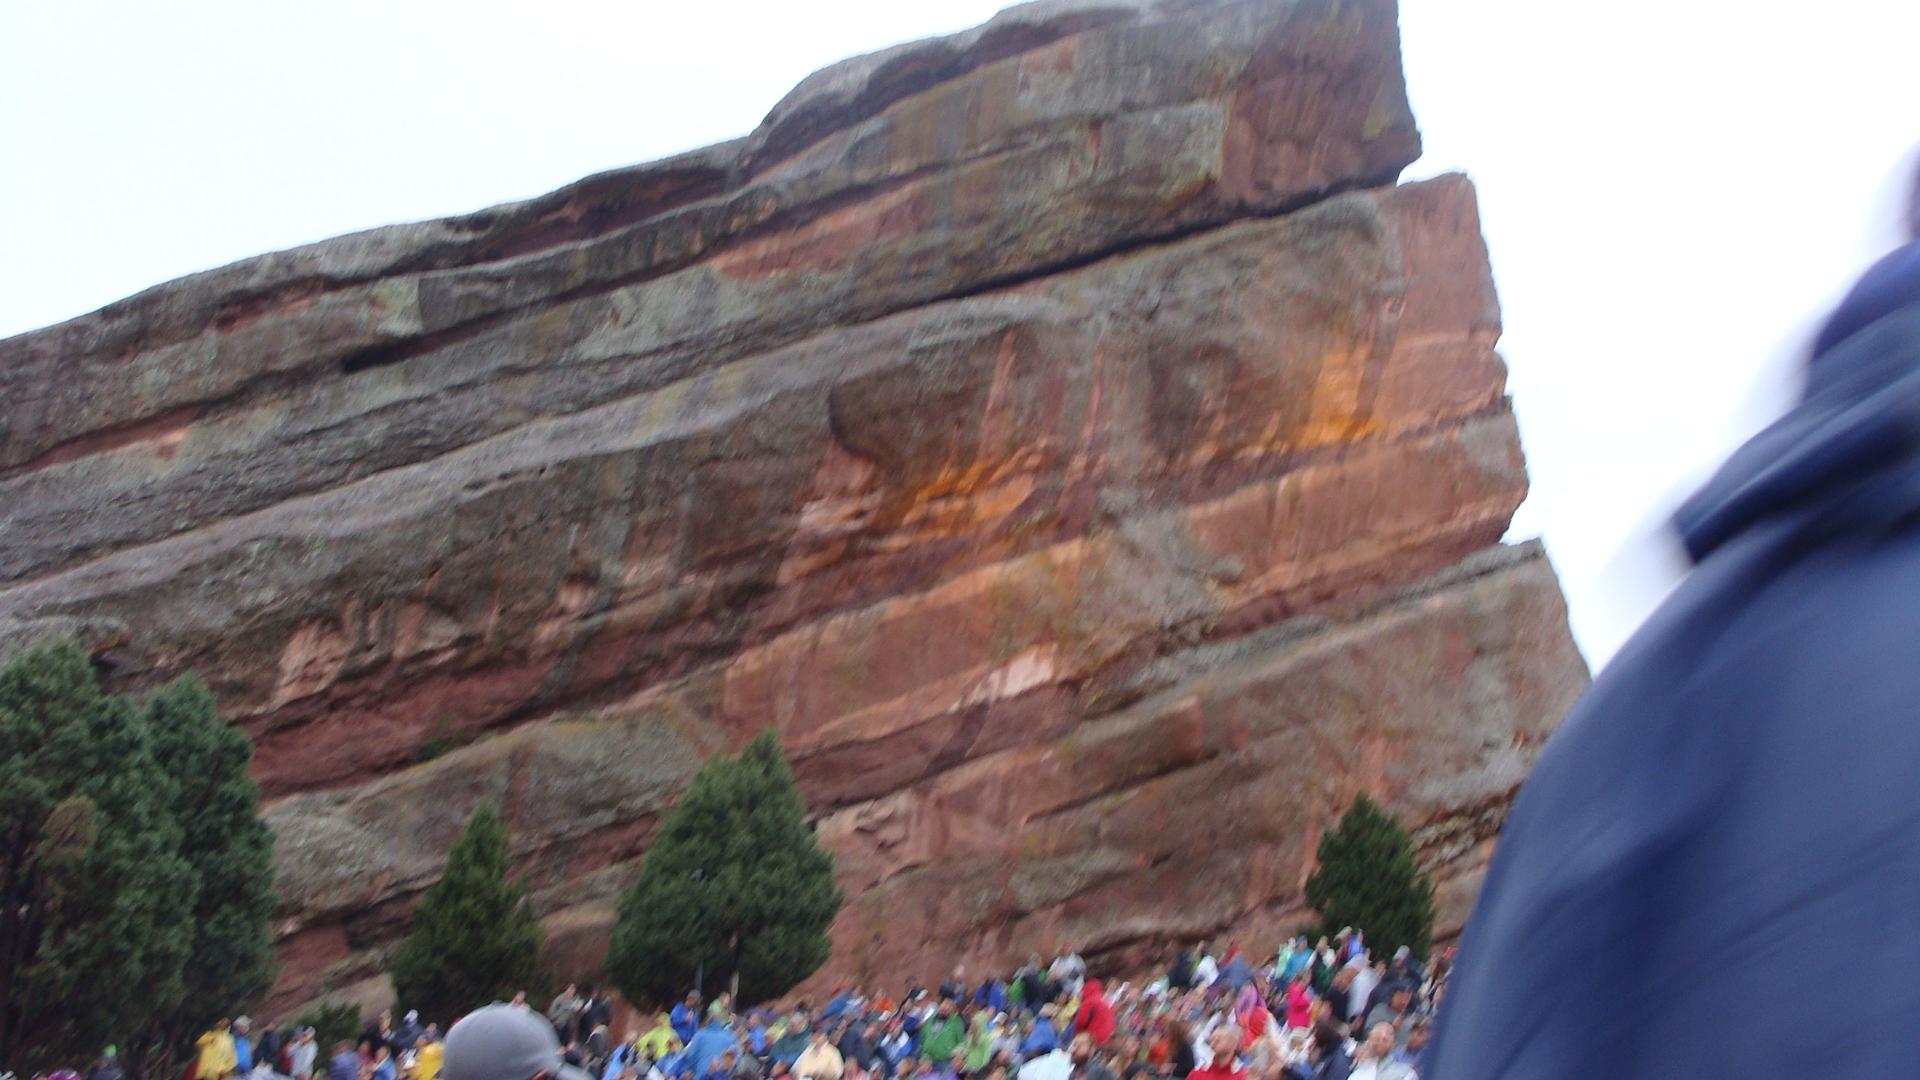 Red Rocks Amphitheater - Morrison, Colorado